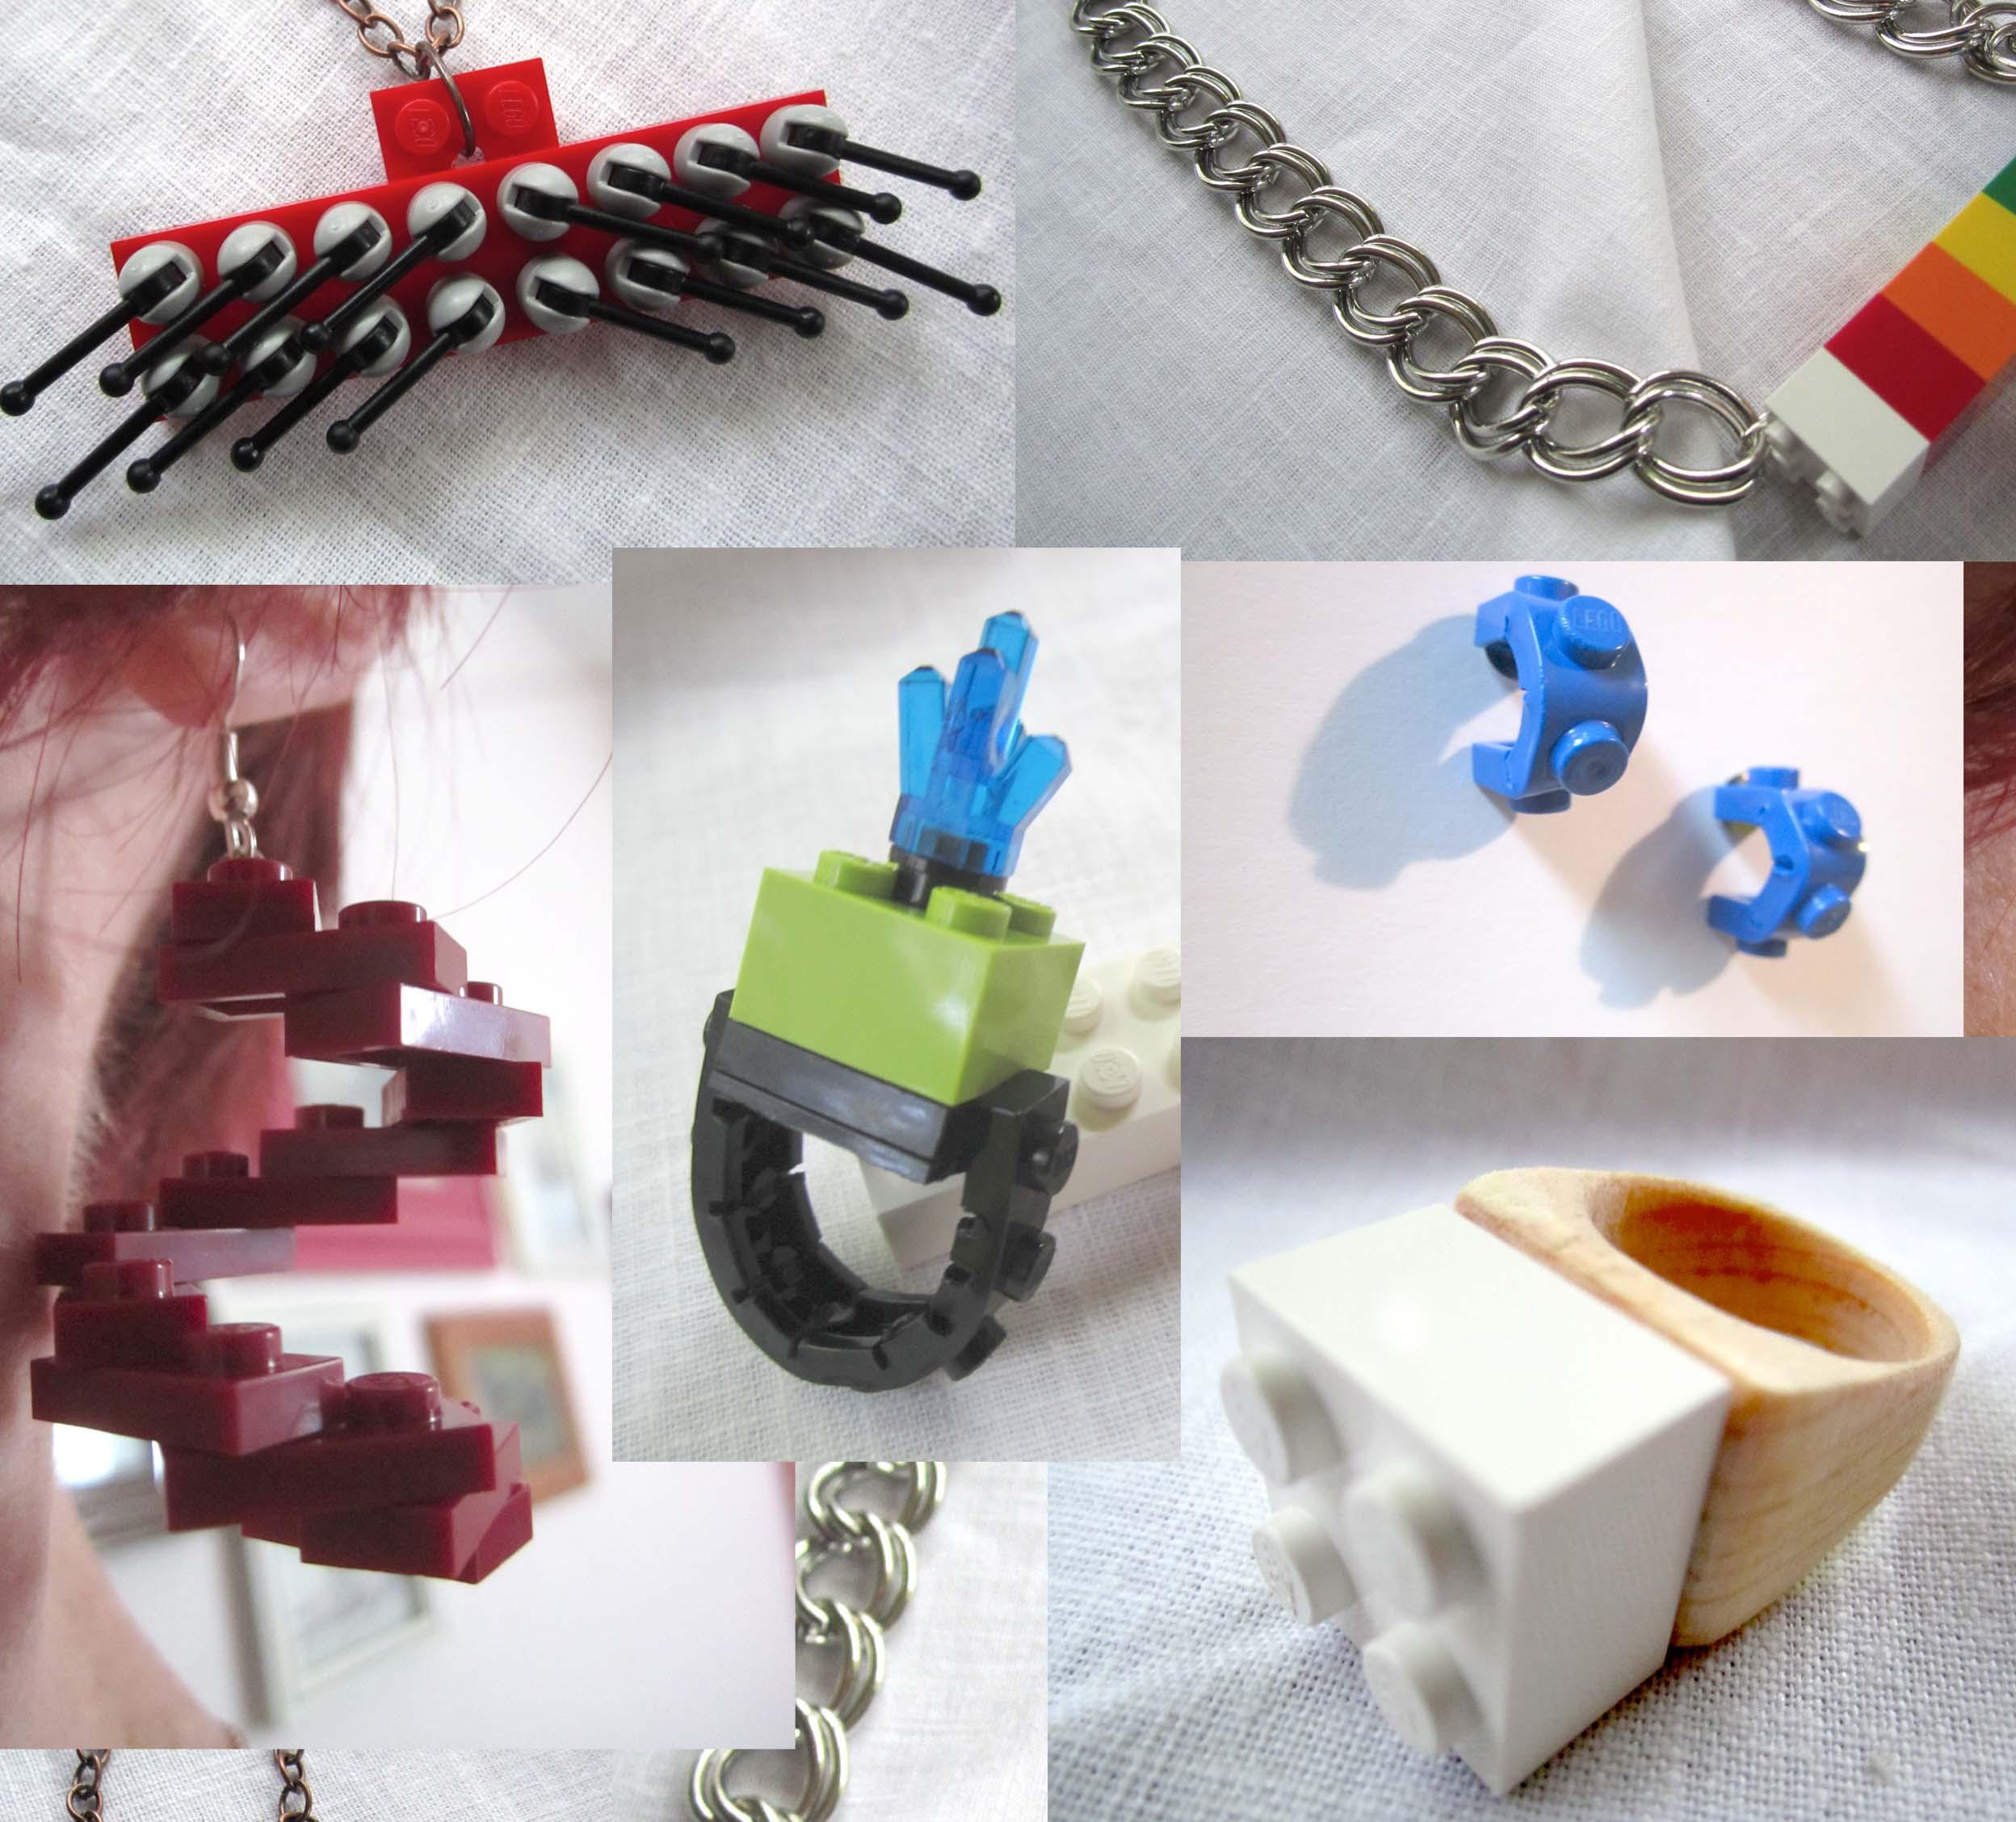 Lego Jewels - 6 Customizable Lego Jewelry Designs